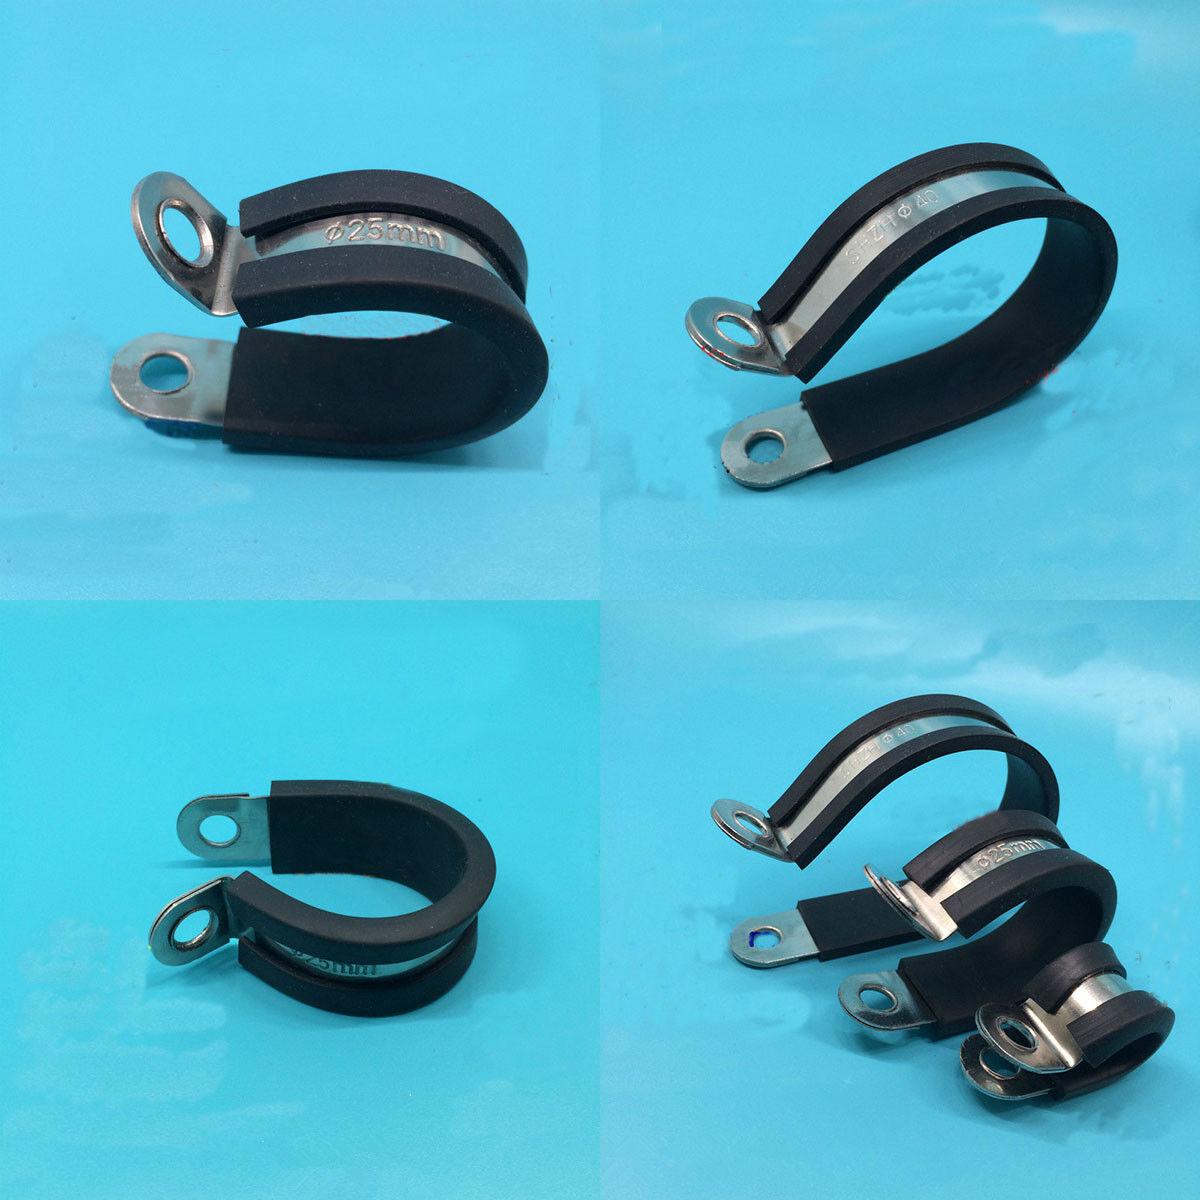 5 x 40mm MIKALOR Zinc Plated Steel EPDM Rubber Lined P Clip Fuel Hose Pipe Cable